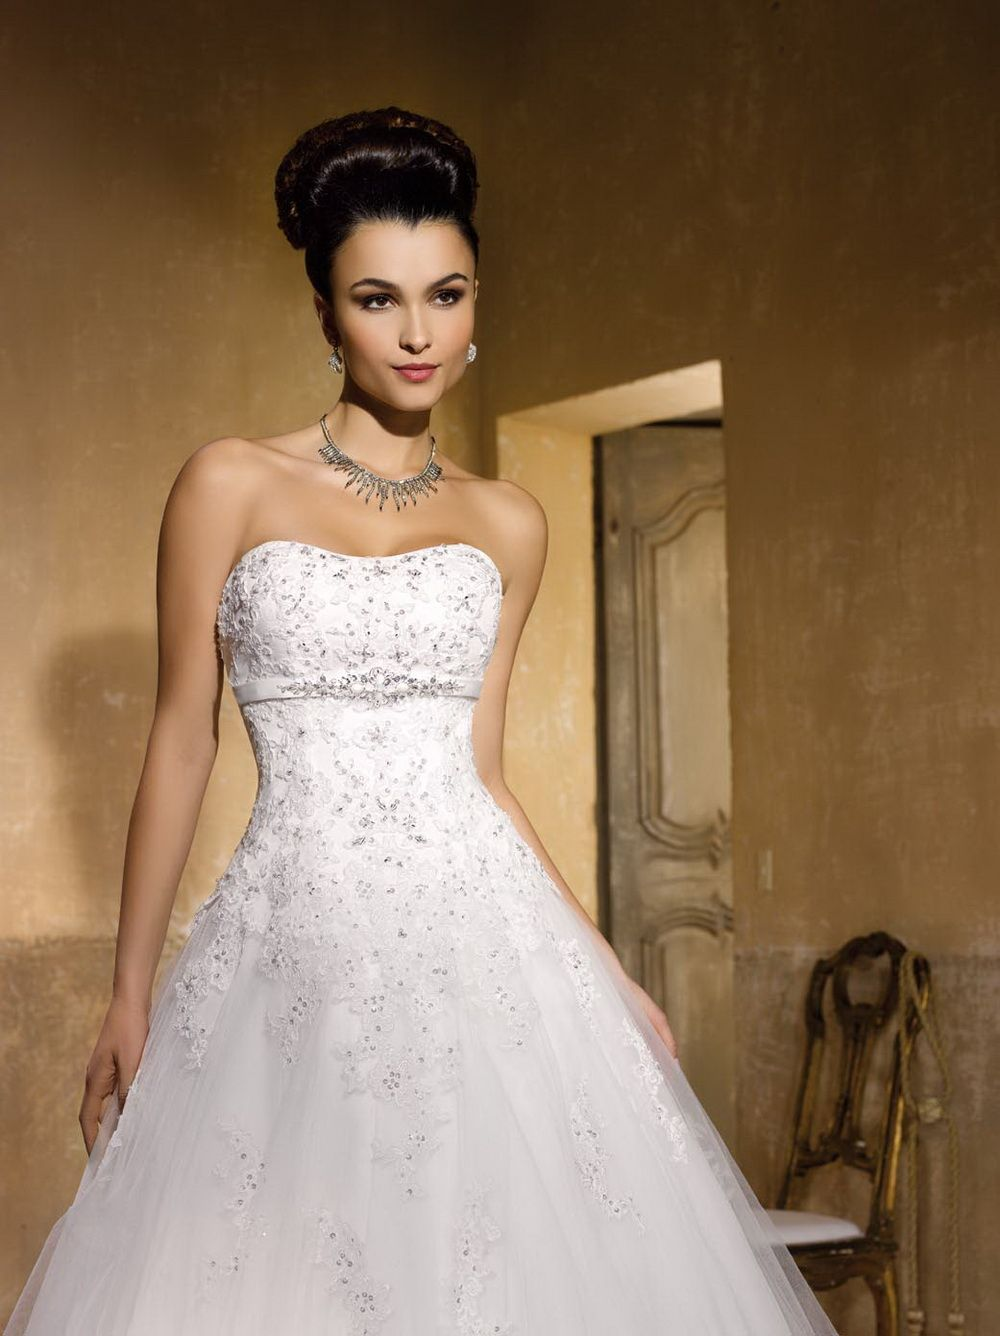 161-43 - Robe de mariée MISS KELLY 2016